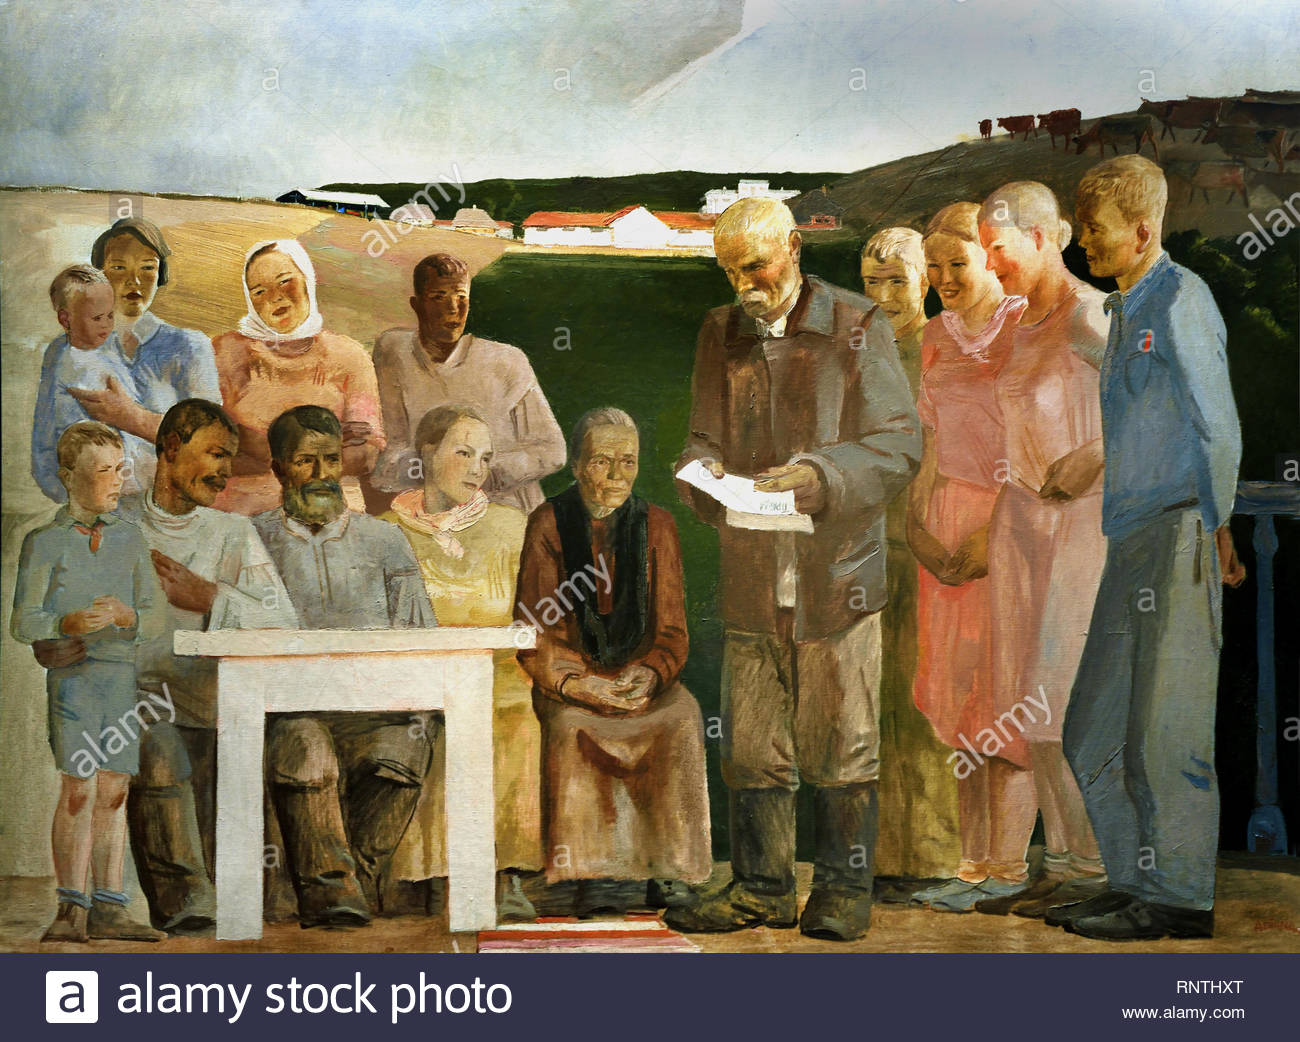 Collective Farm Brigade 1934 by Alexander Deyneka Soviet Union Communist Propaganda (Russia under Lenin and Stalin1921-1953 ). - Stock Image